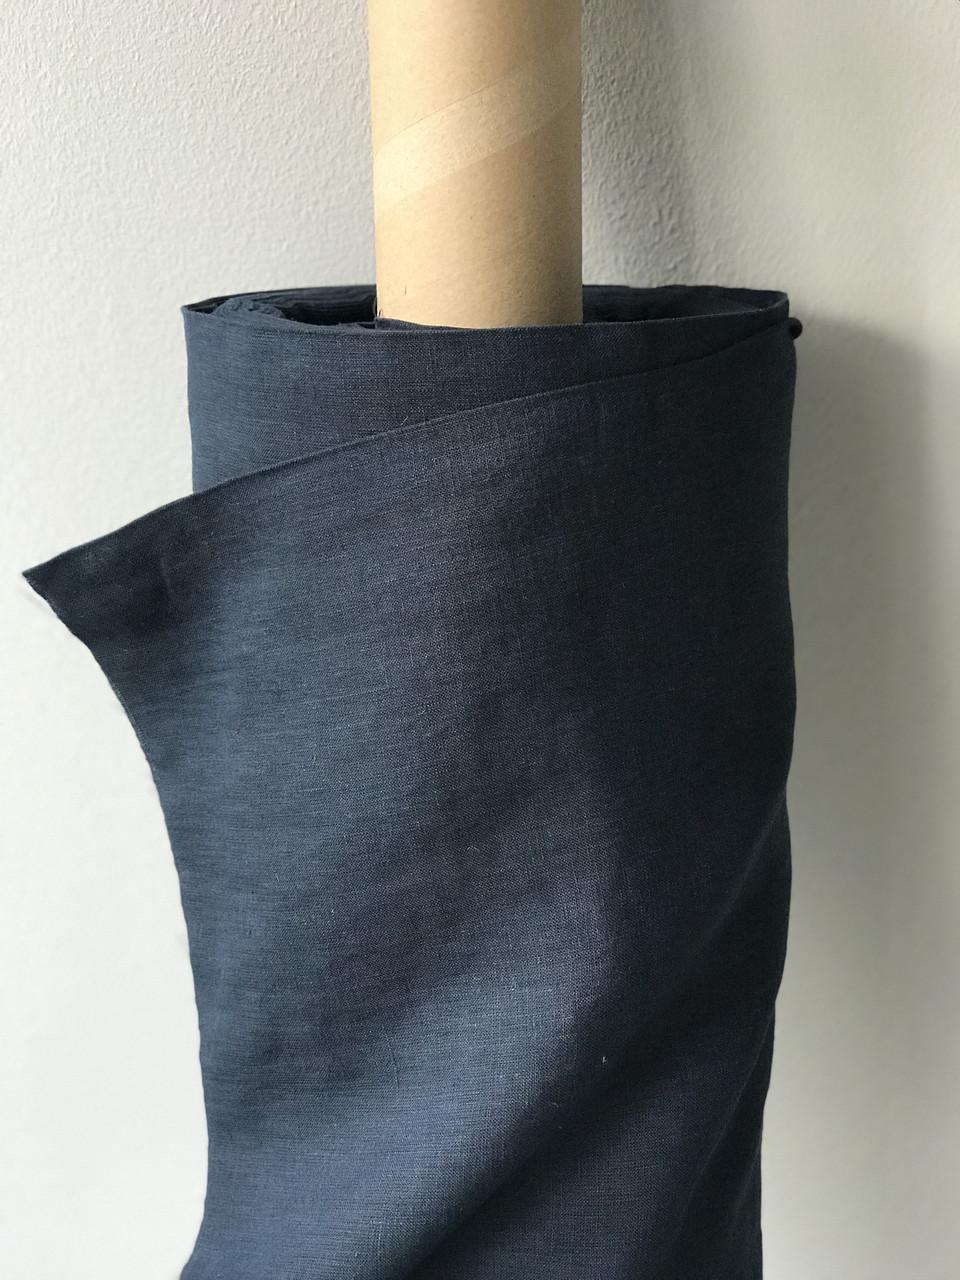 Темно-синяя льняная ткань, 100% лен, цвет 999, CRASH EFFECT